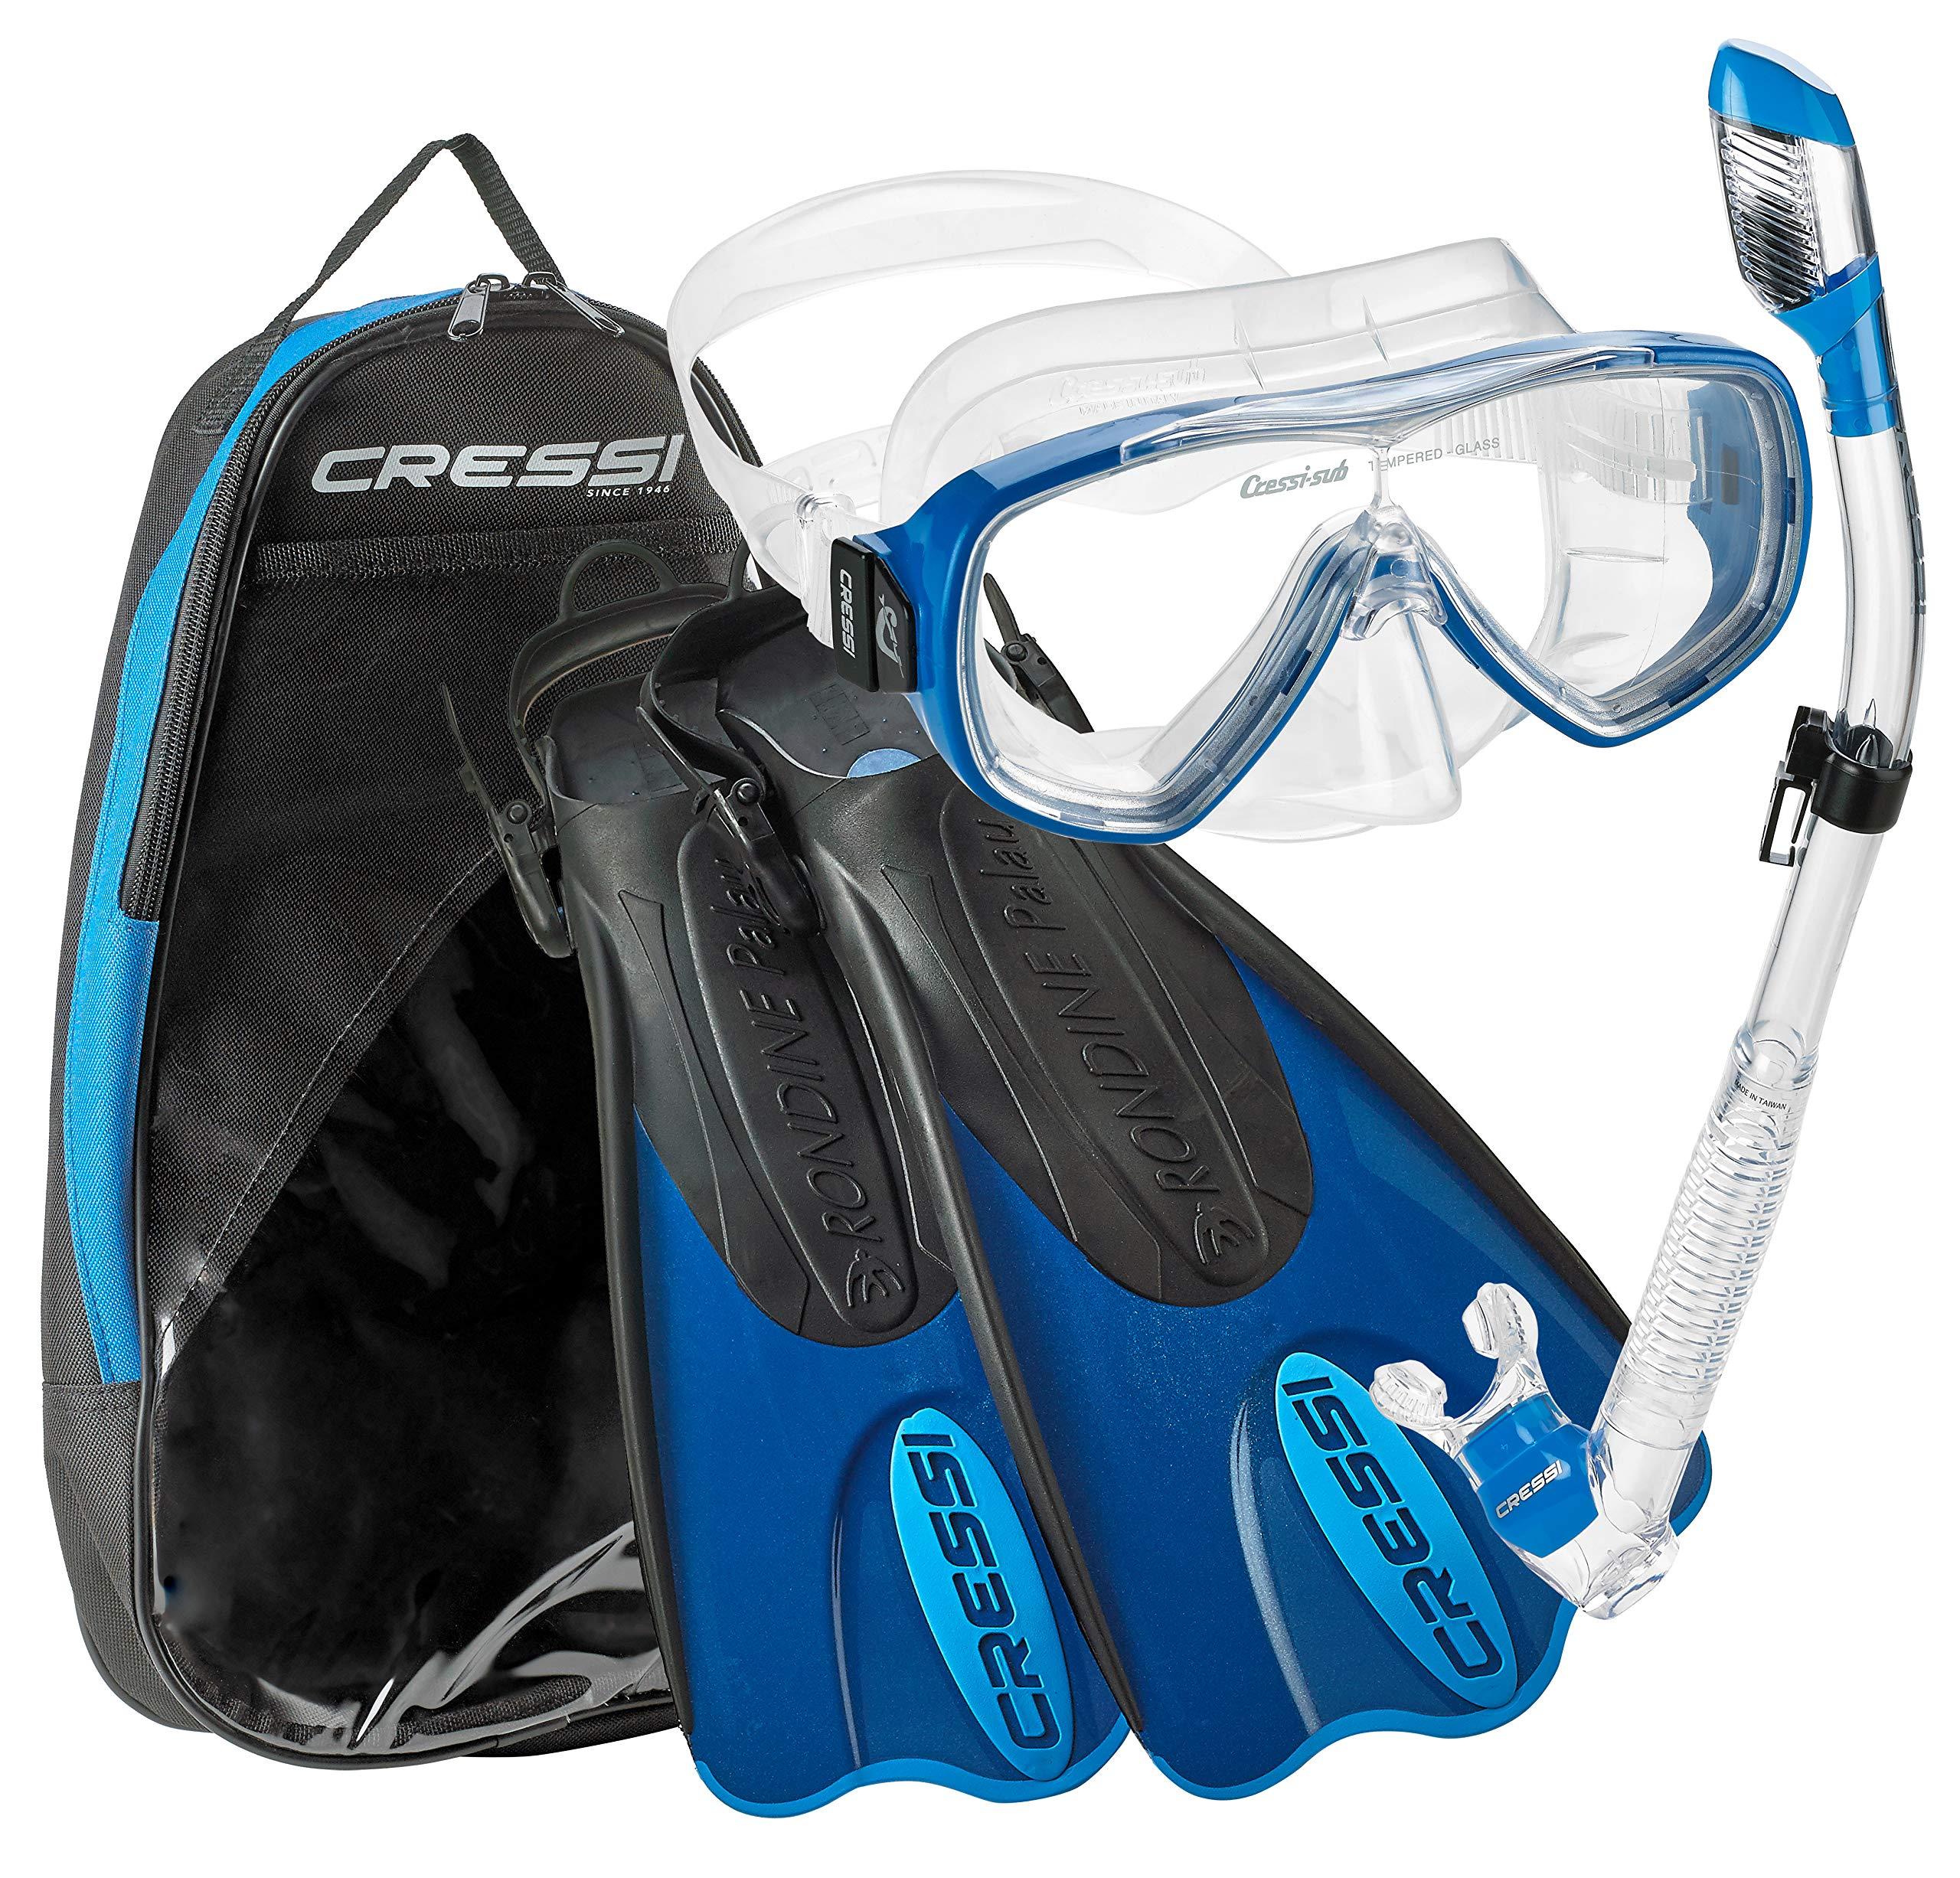 Cressi Palau Short Onda Dry Snorkel Deluxe Bag Mask Fin Snorkel Set - Blue - XS